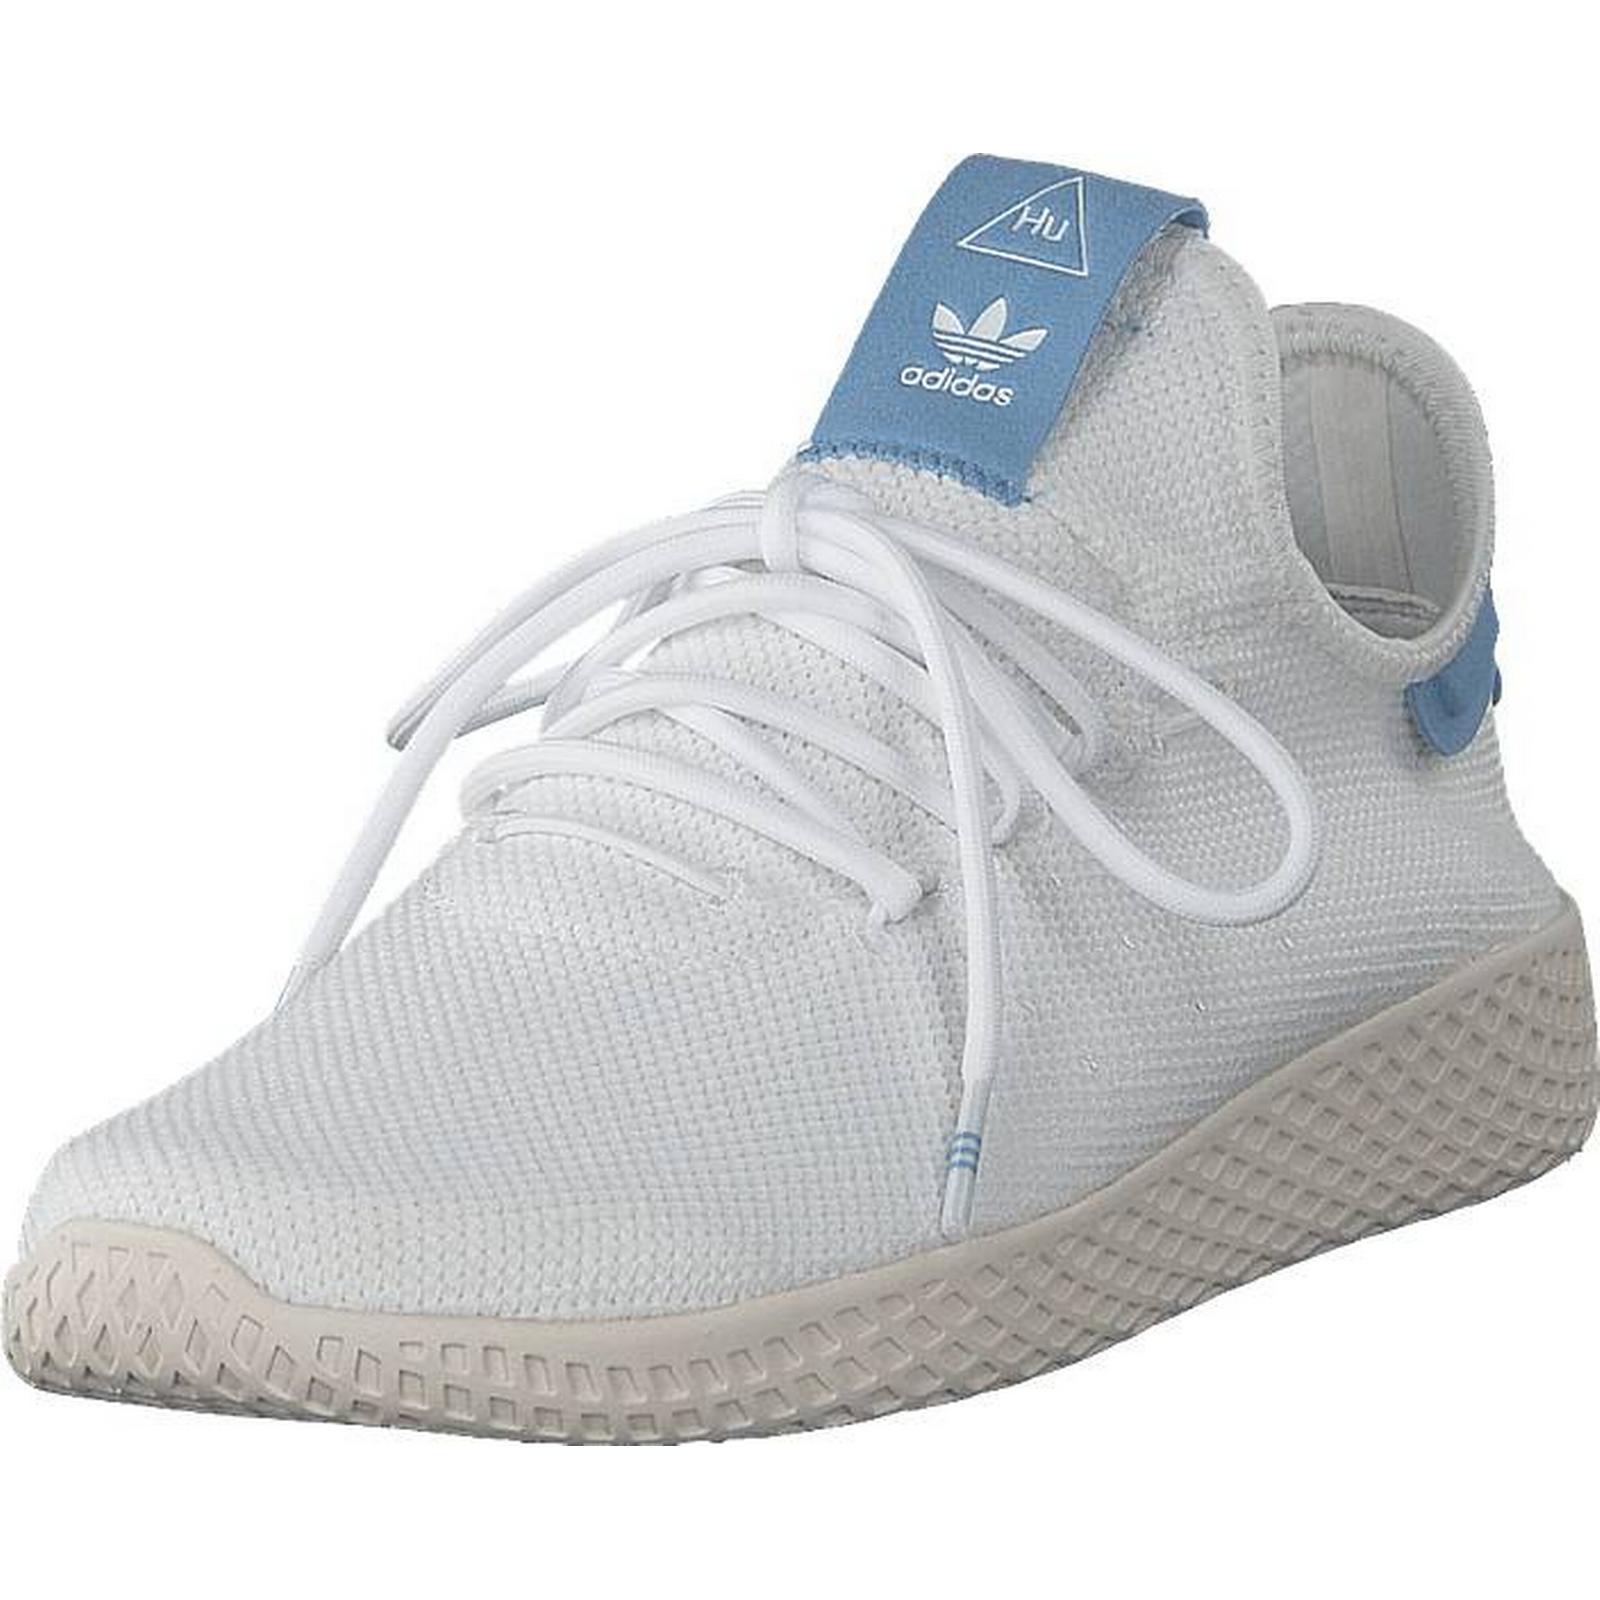 Adidas Originals Pw Tennis Tennis Pw Hu Ftwr White/Chalk White, Shoes, Trainers & Sport Shoes , Running Shoes, White, Unisex, 37 e94d27